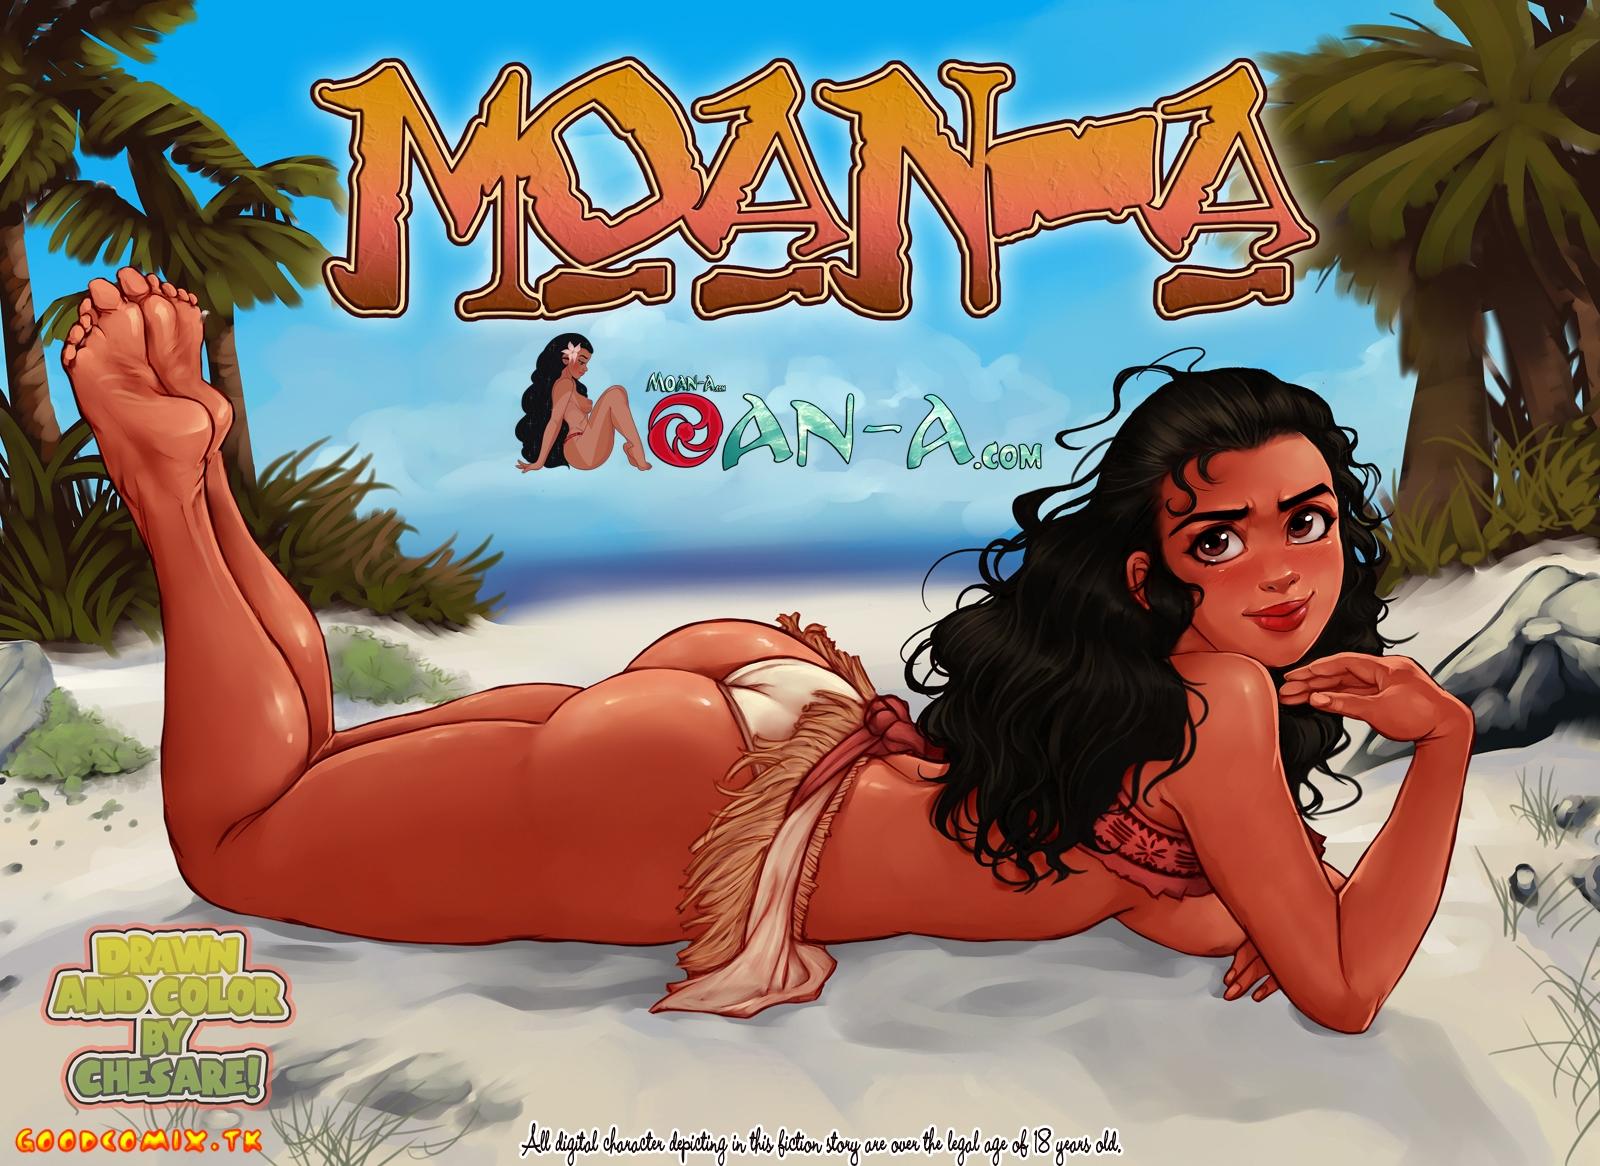 Goodcomix.tk Moana - [Moan-a][ChEsArE] - Moan 2 -  Last Task